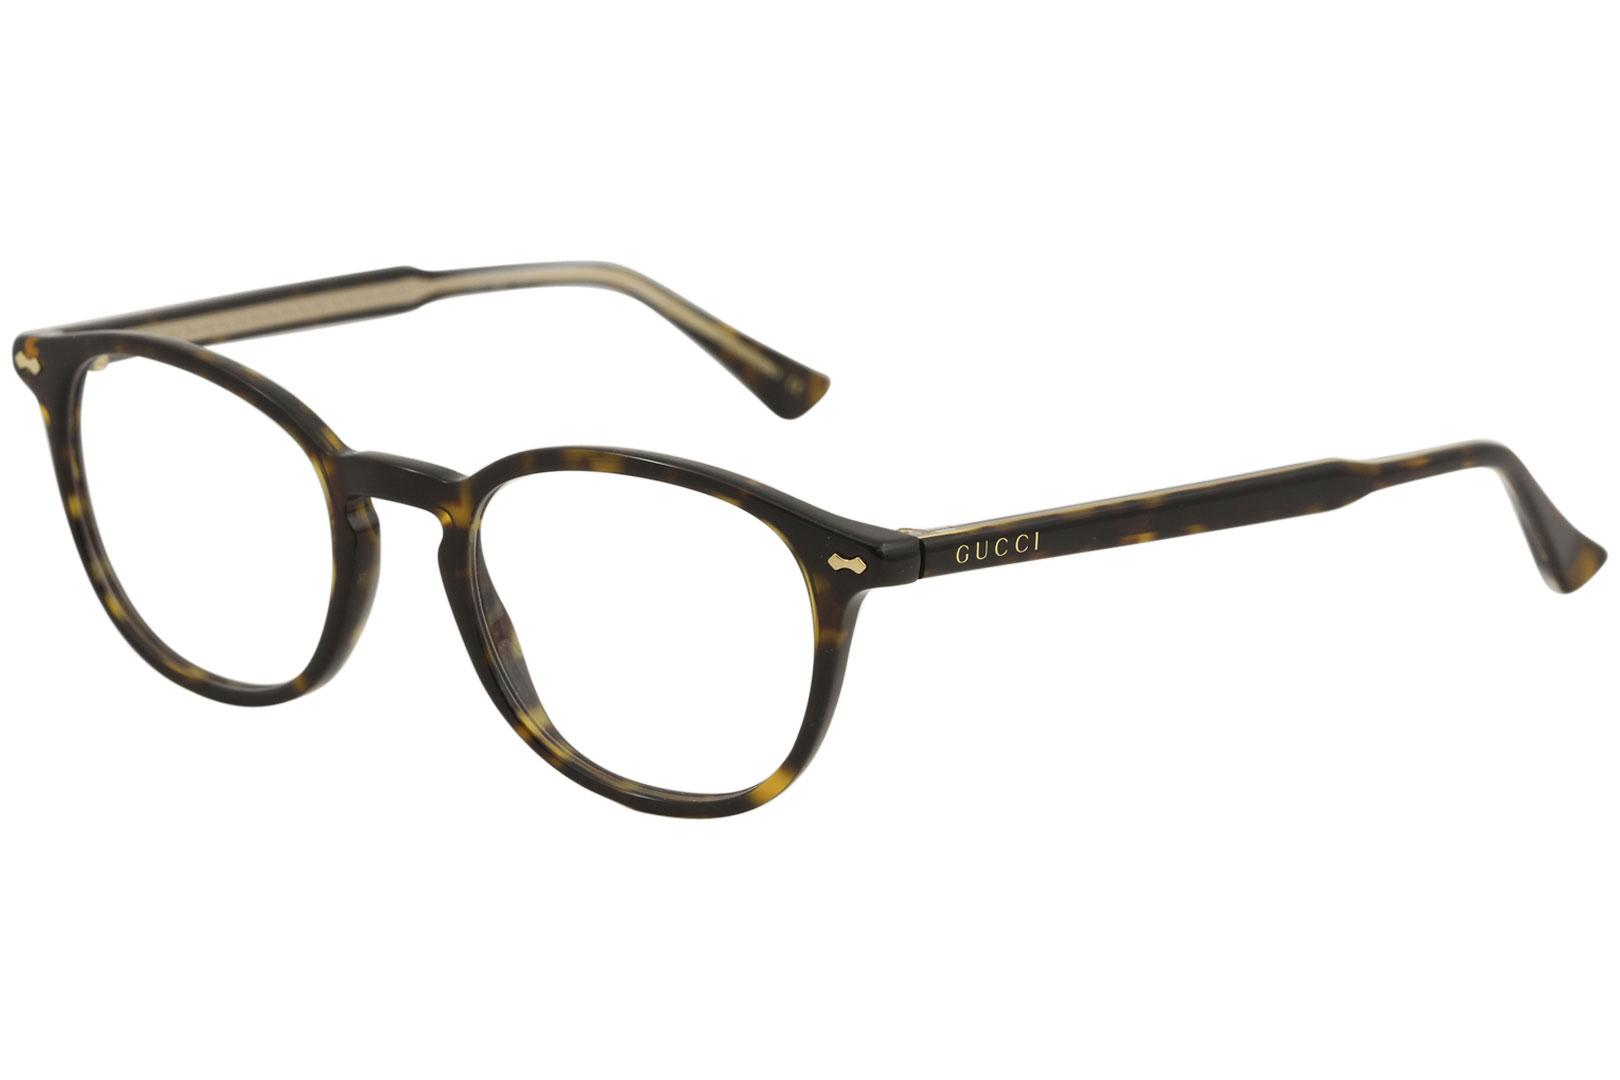 dd0b87156cc Gucci Men s Eyeglasses GG0187O GG 0187 O Full Rim Optical Frame